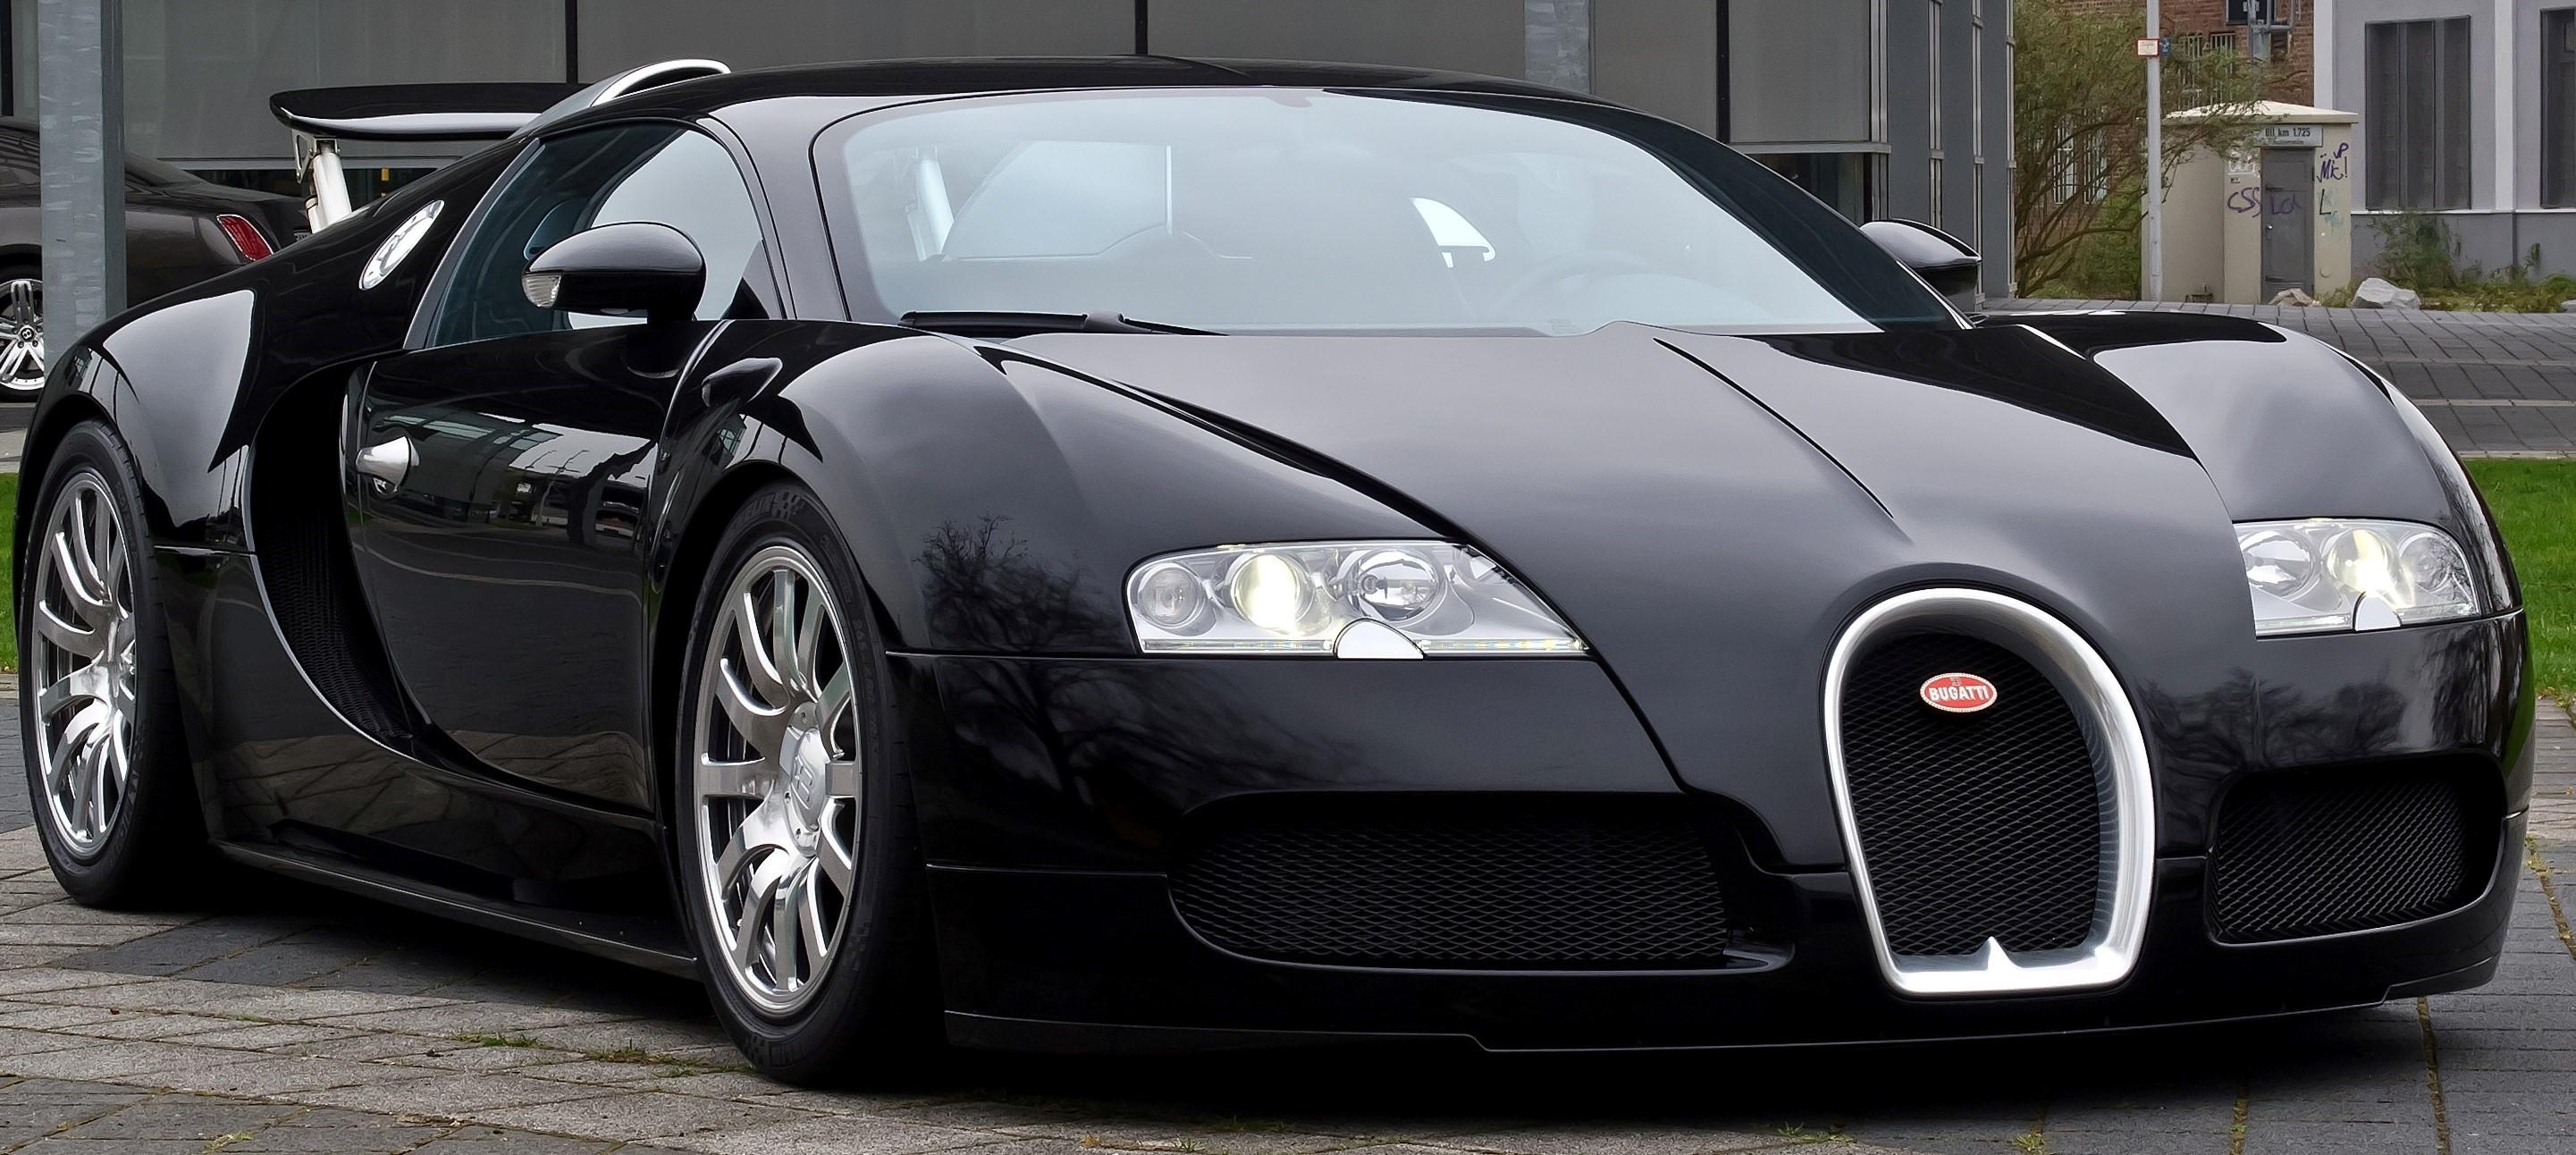 Bugatti Veyron Background Wallpapersafari